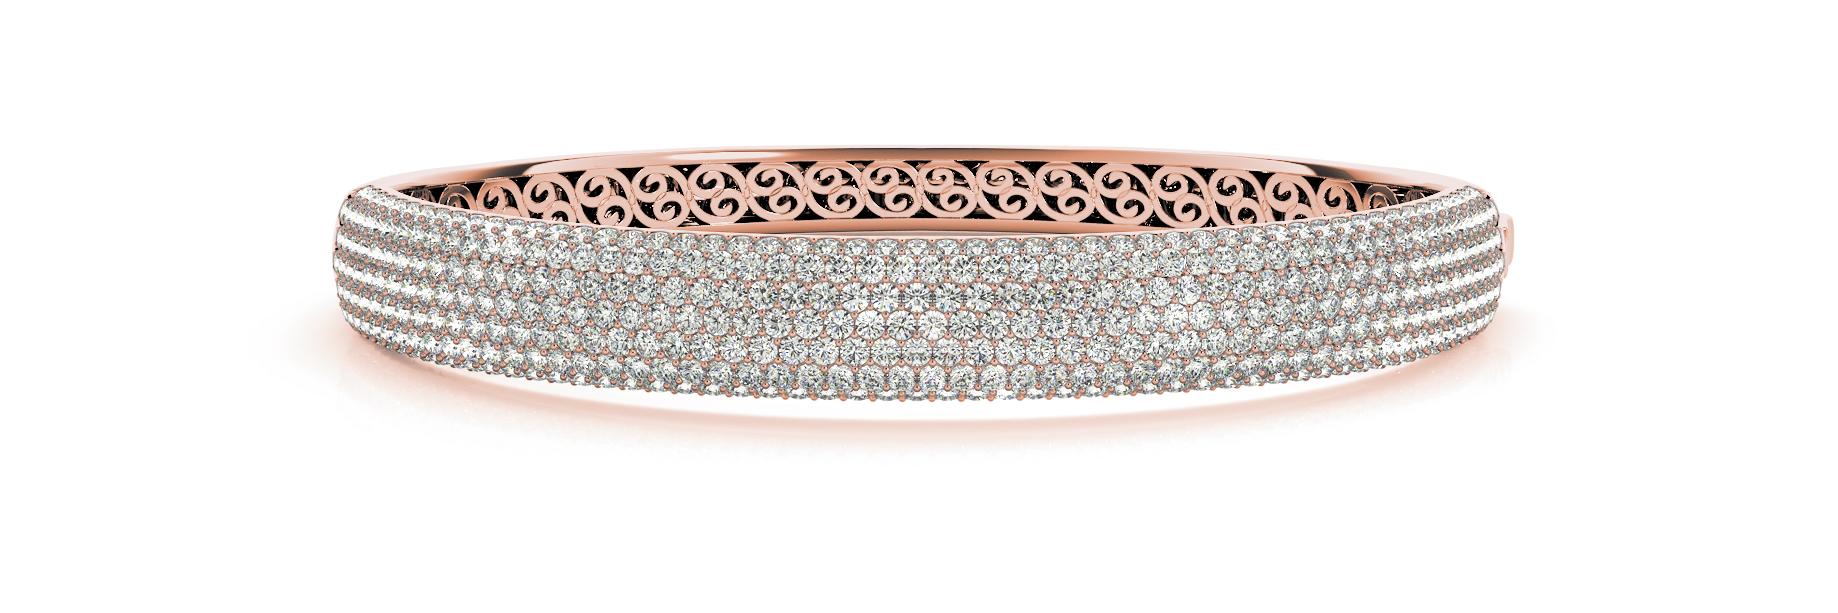 Rose Gold Micro Pavé Wide Lattice Backed Diamond Set Bangle